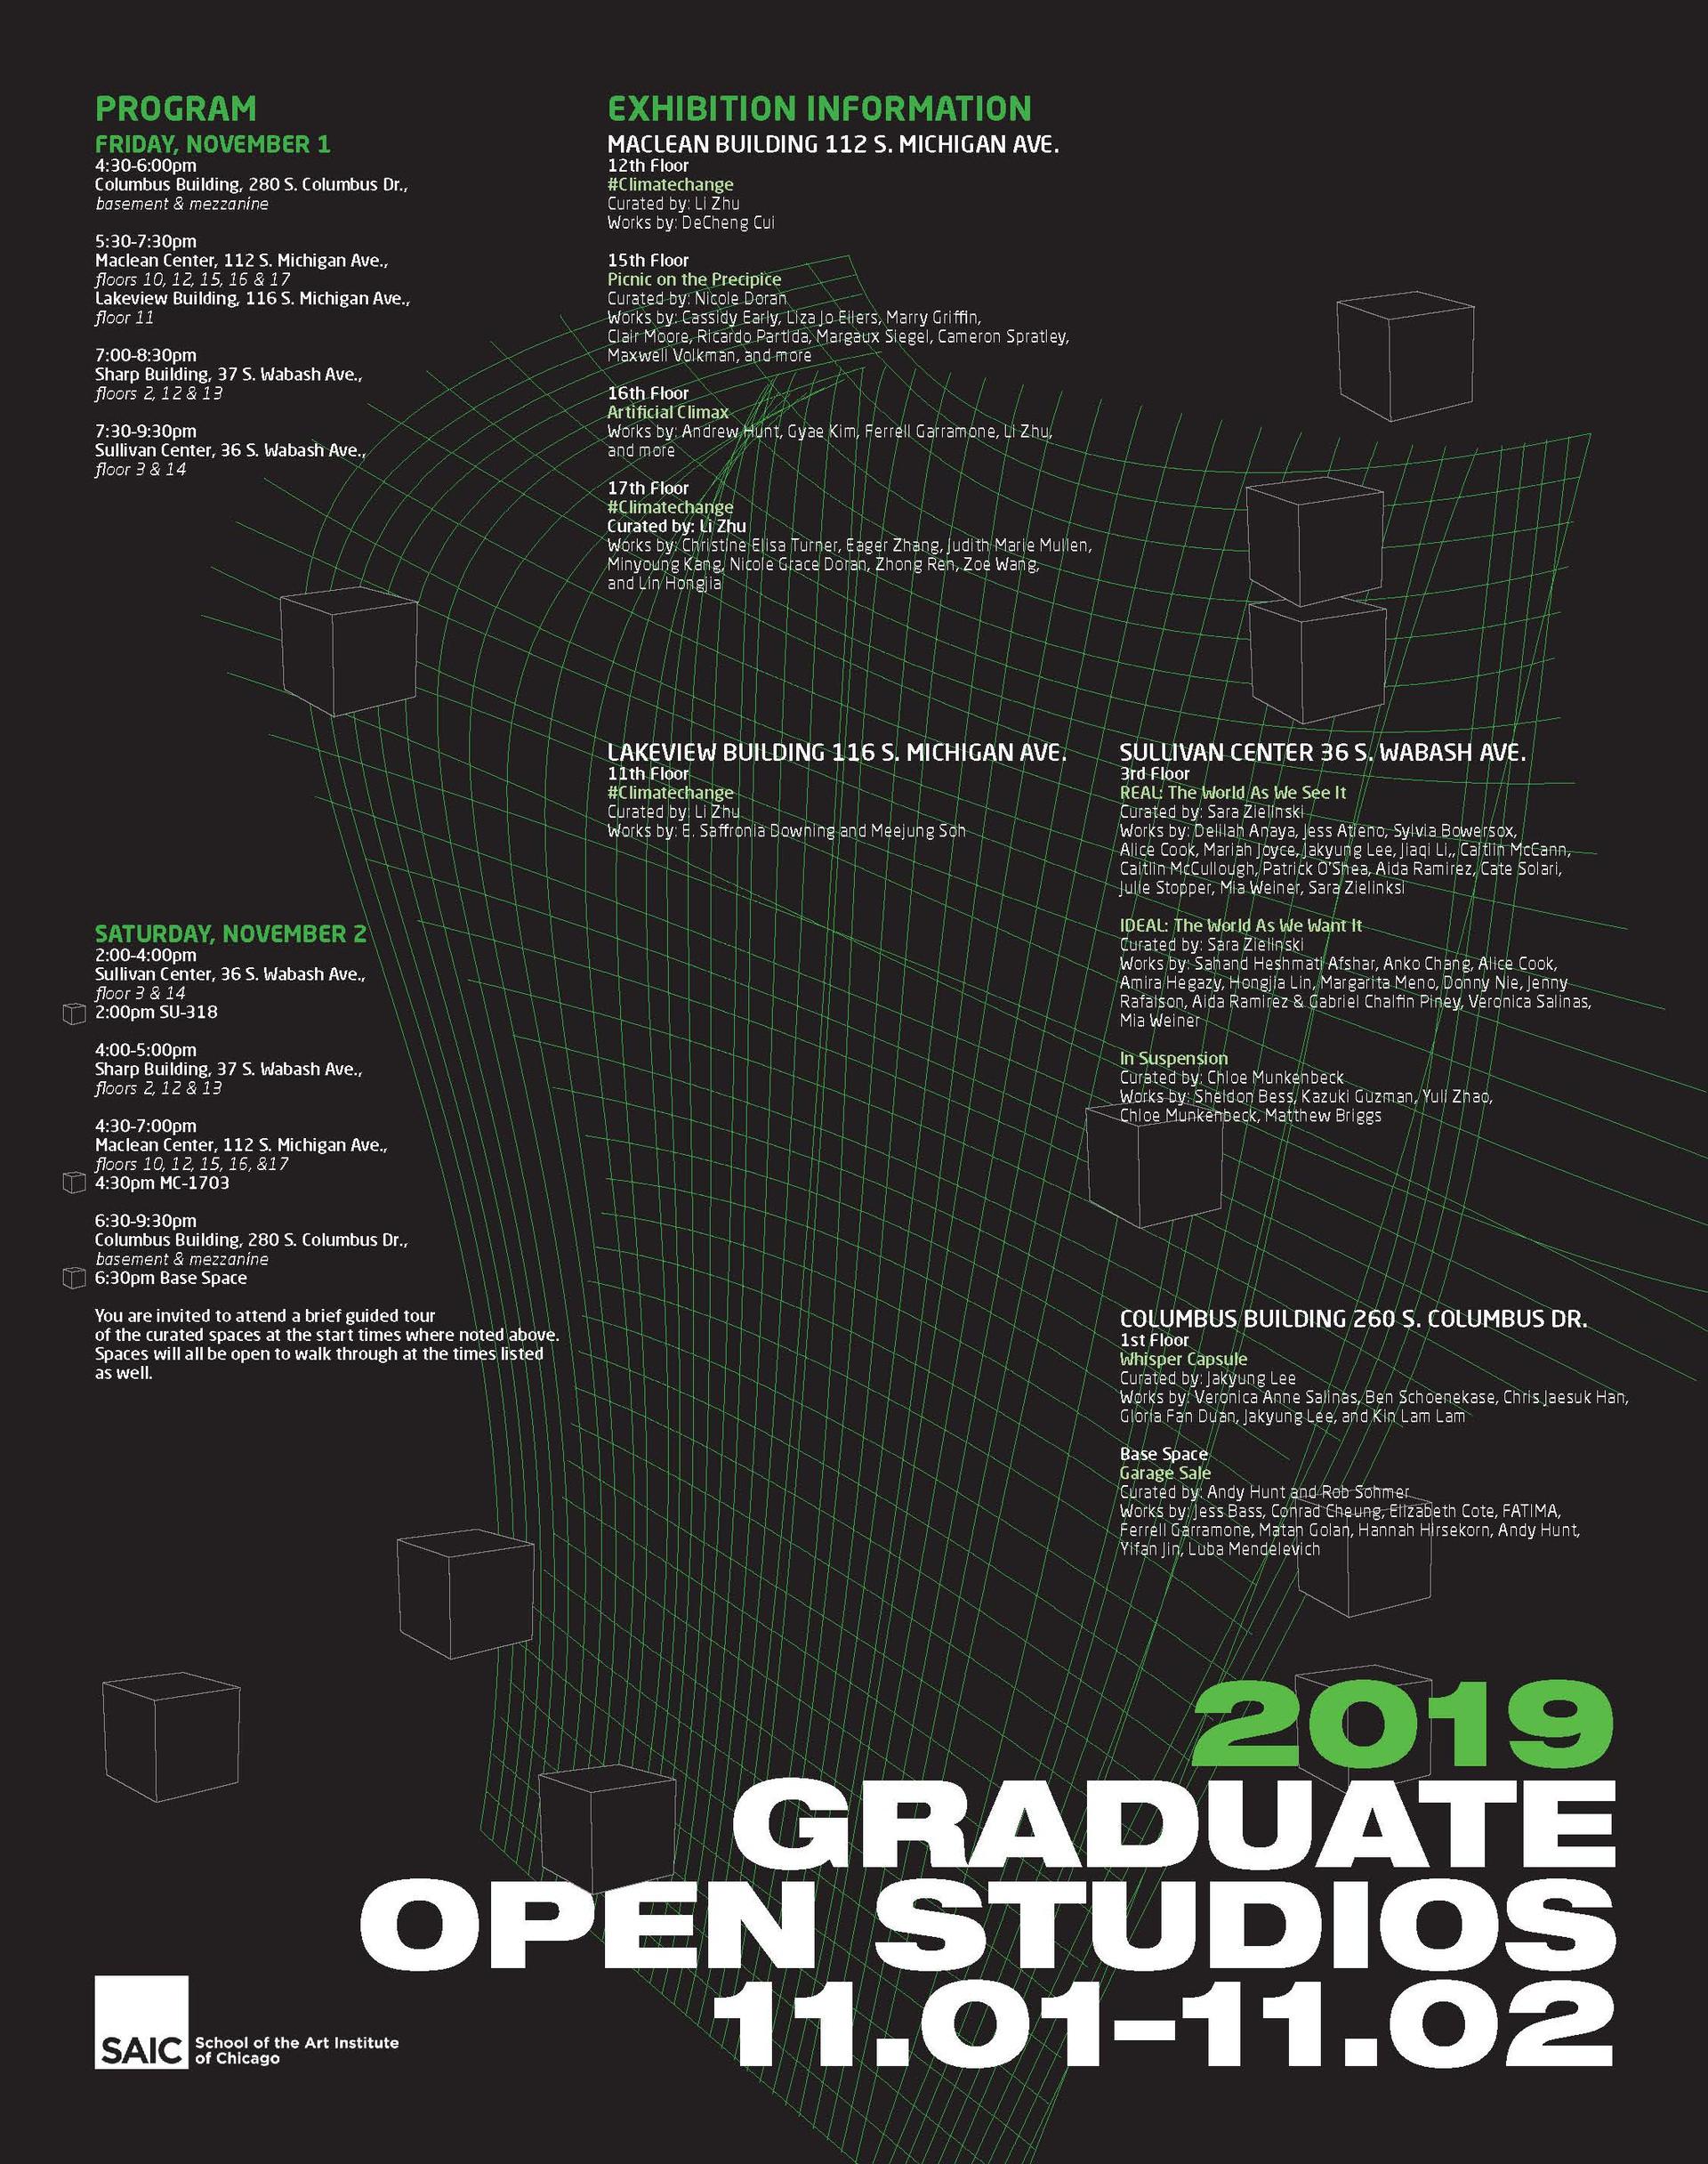 OSN-1023_RieslingD_Poster_v6_Page_1.jpg